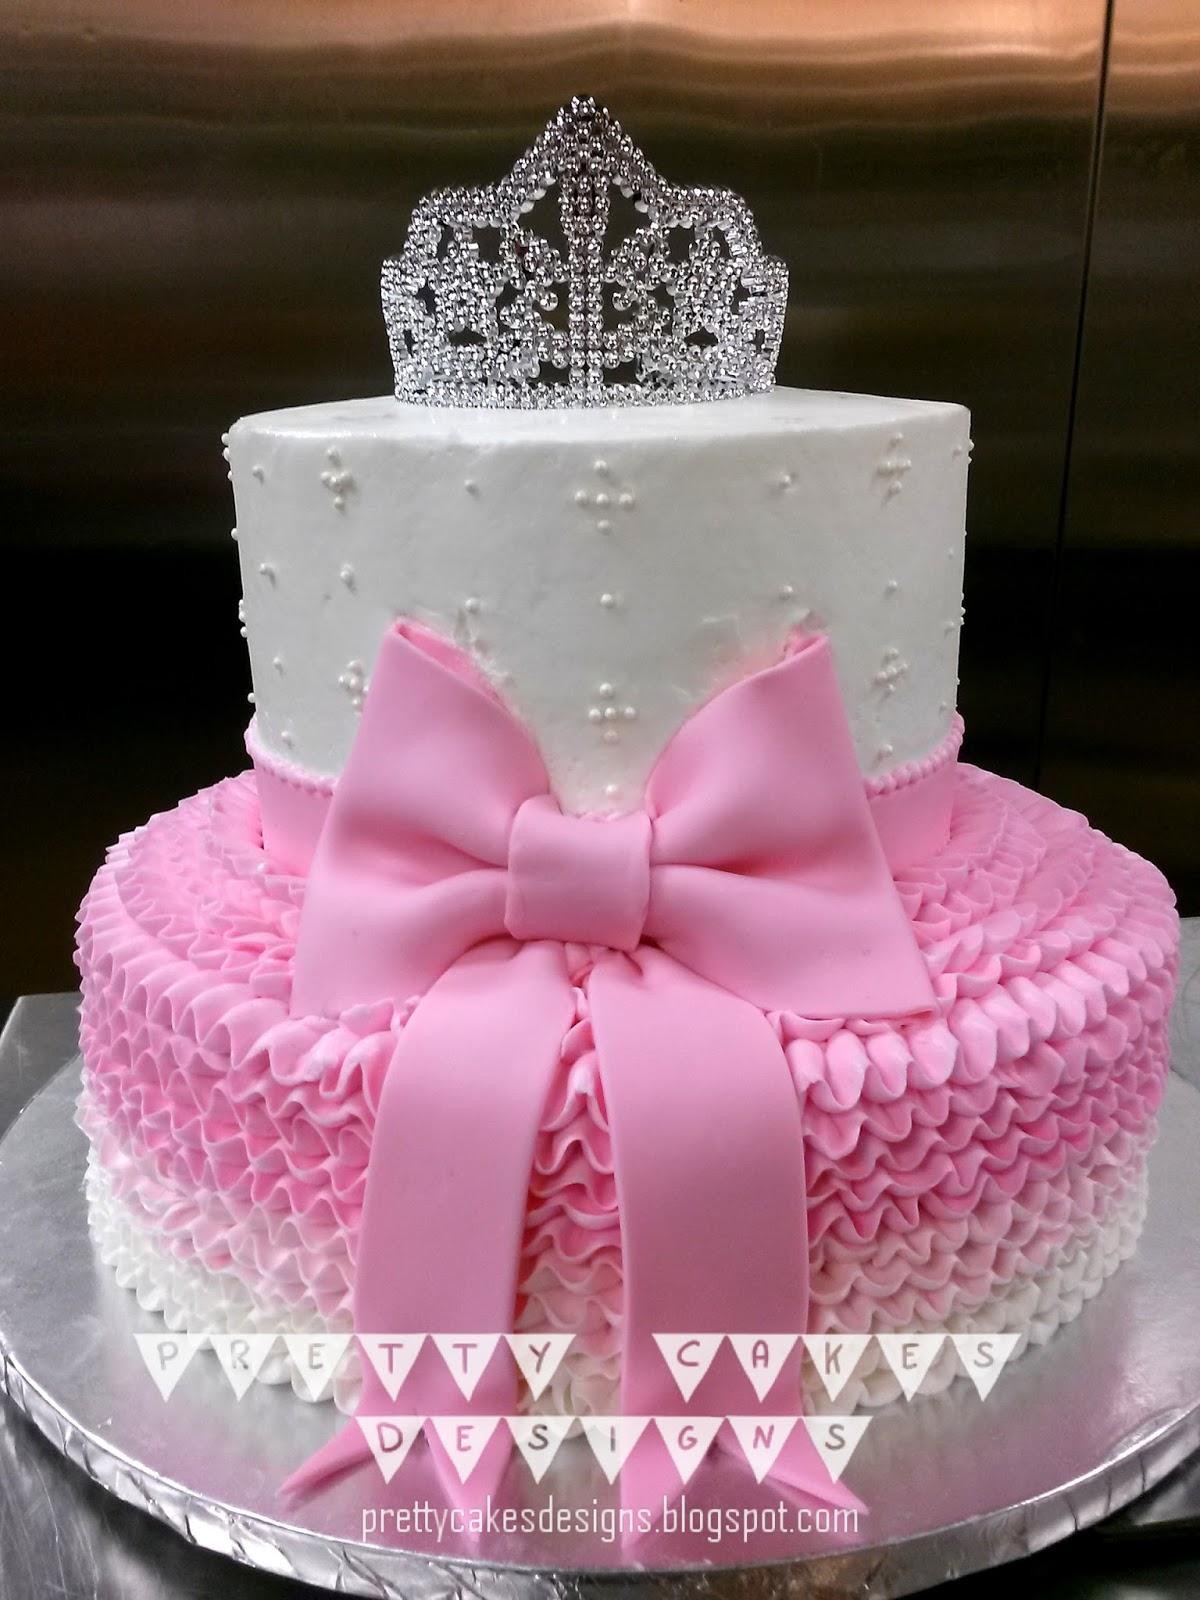 Pretty Cakes Designs: Little Baby Princess